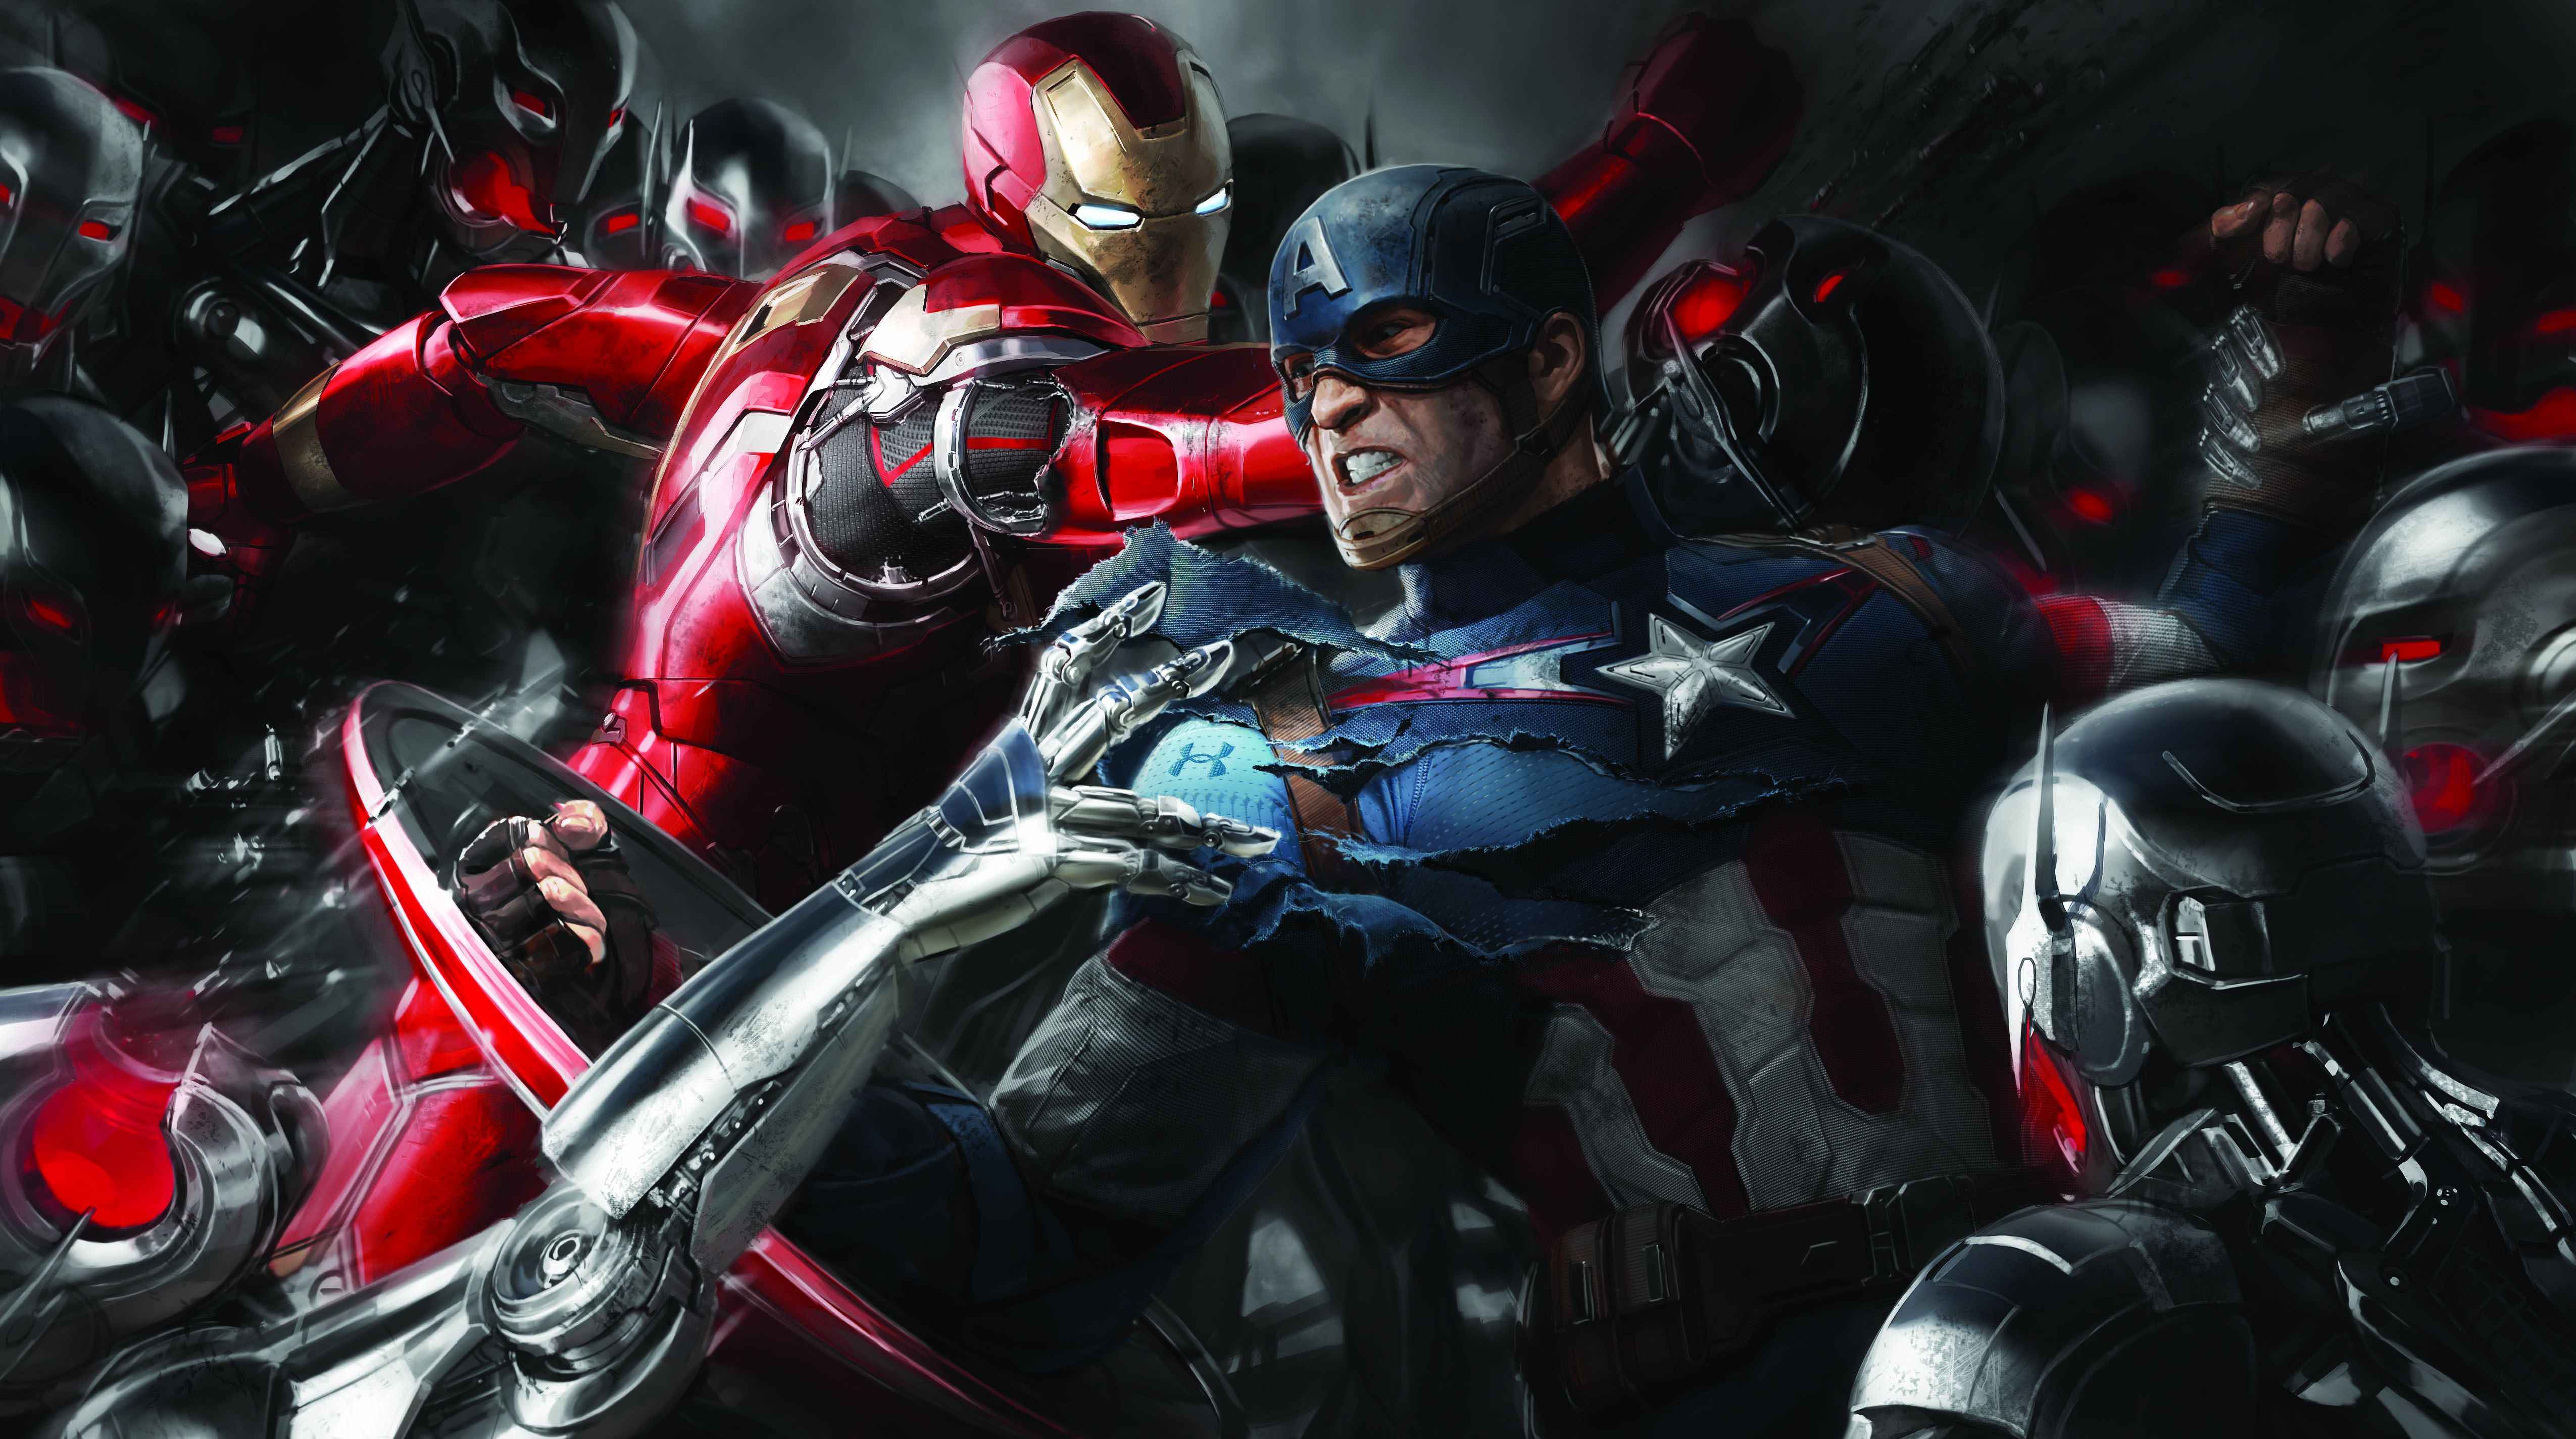 Iron Man 4K Wallpapers - Top Free Iron Man 4K Backgrounds